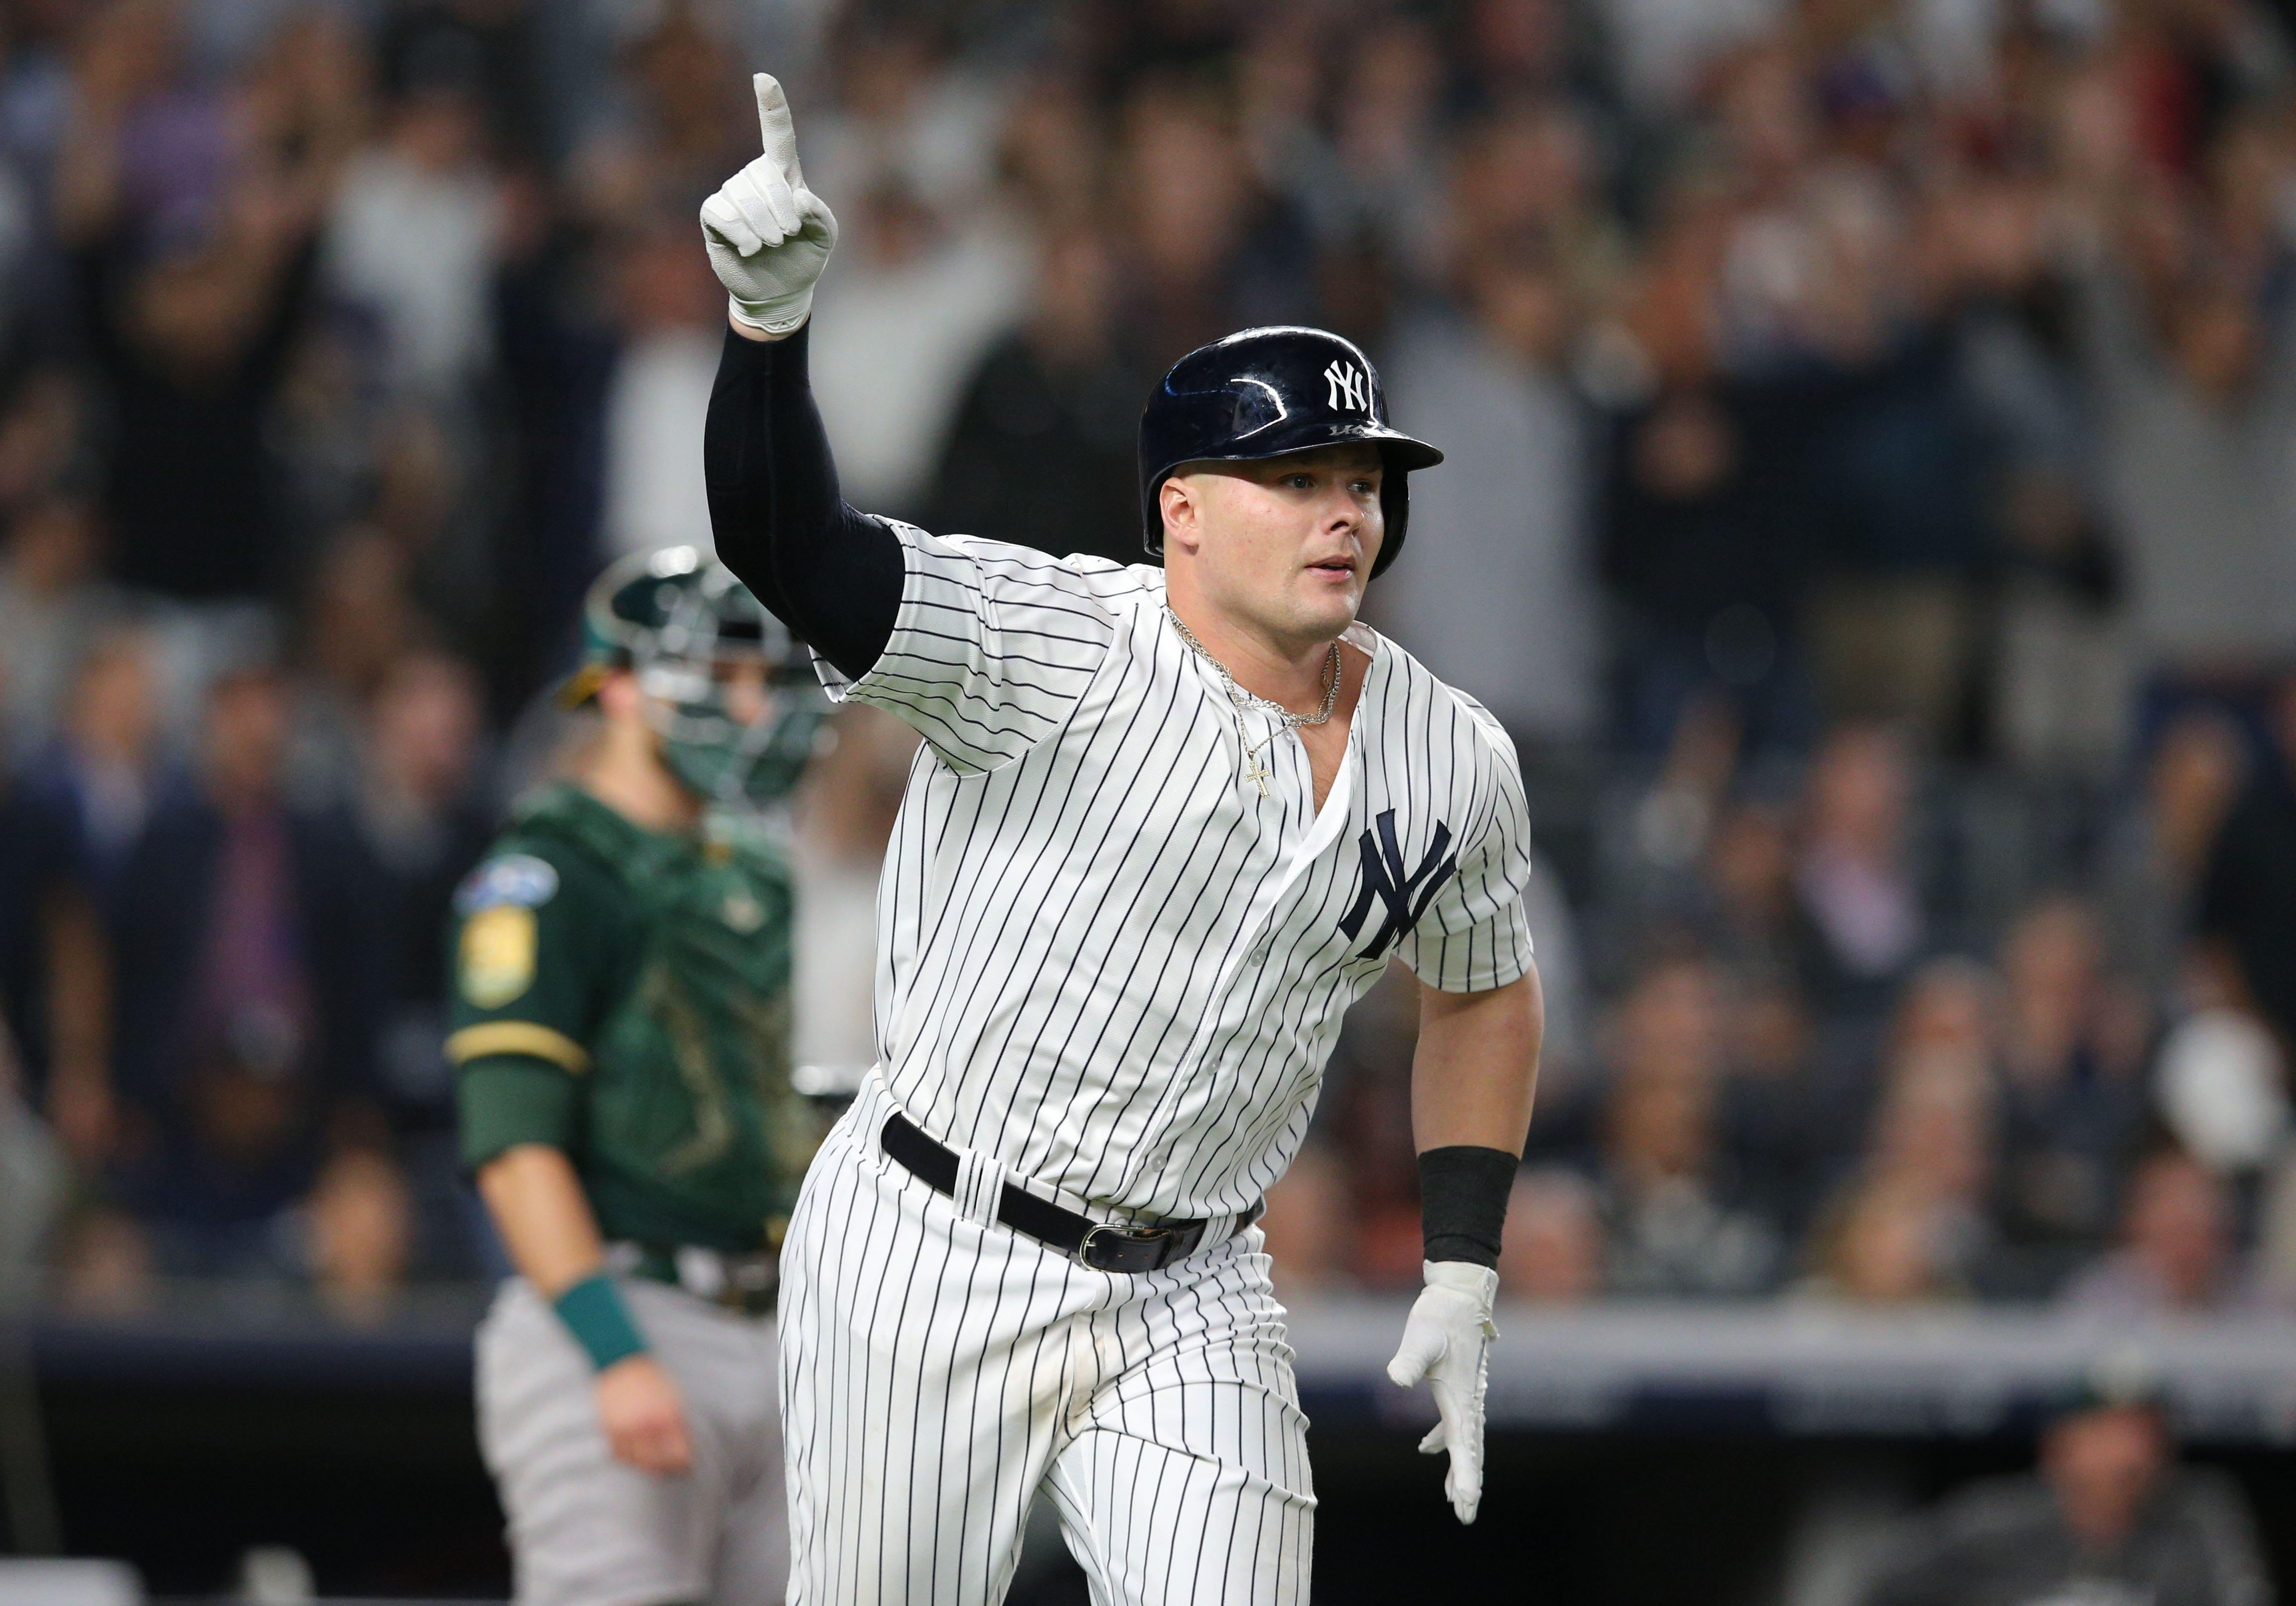 New York Yankees, Yankees, NYY, Luke Voit